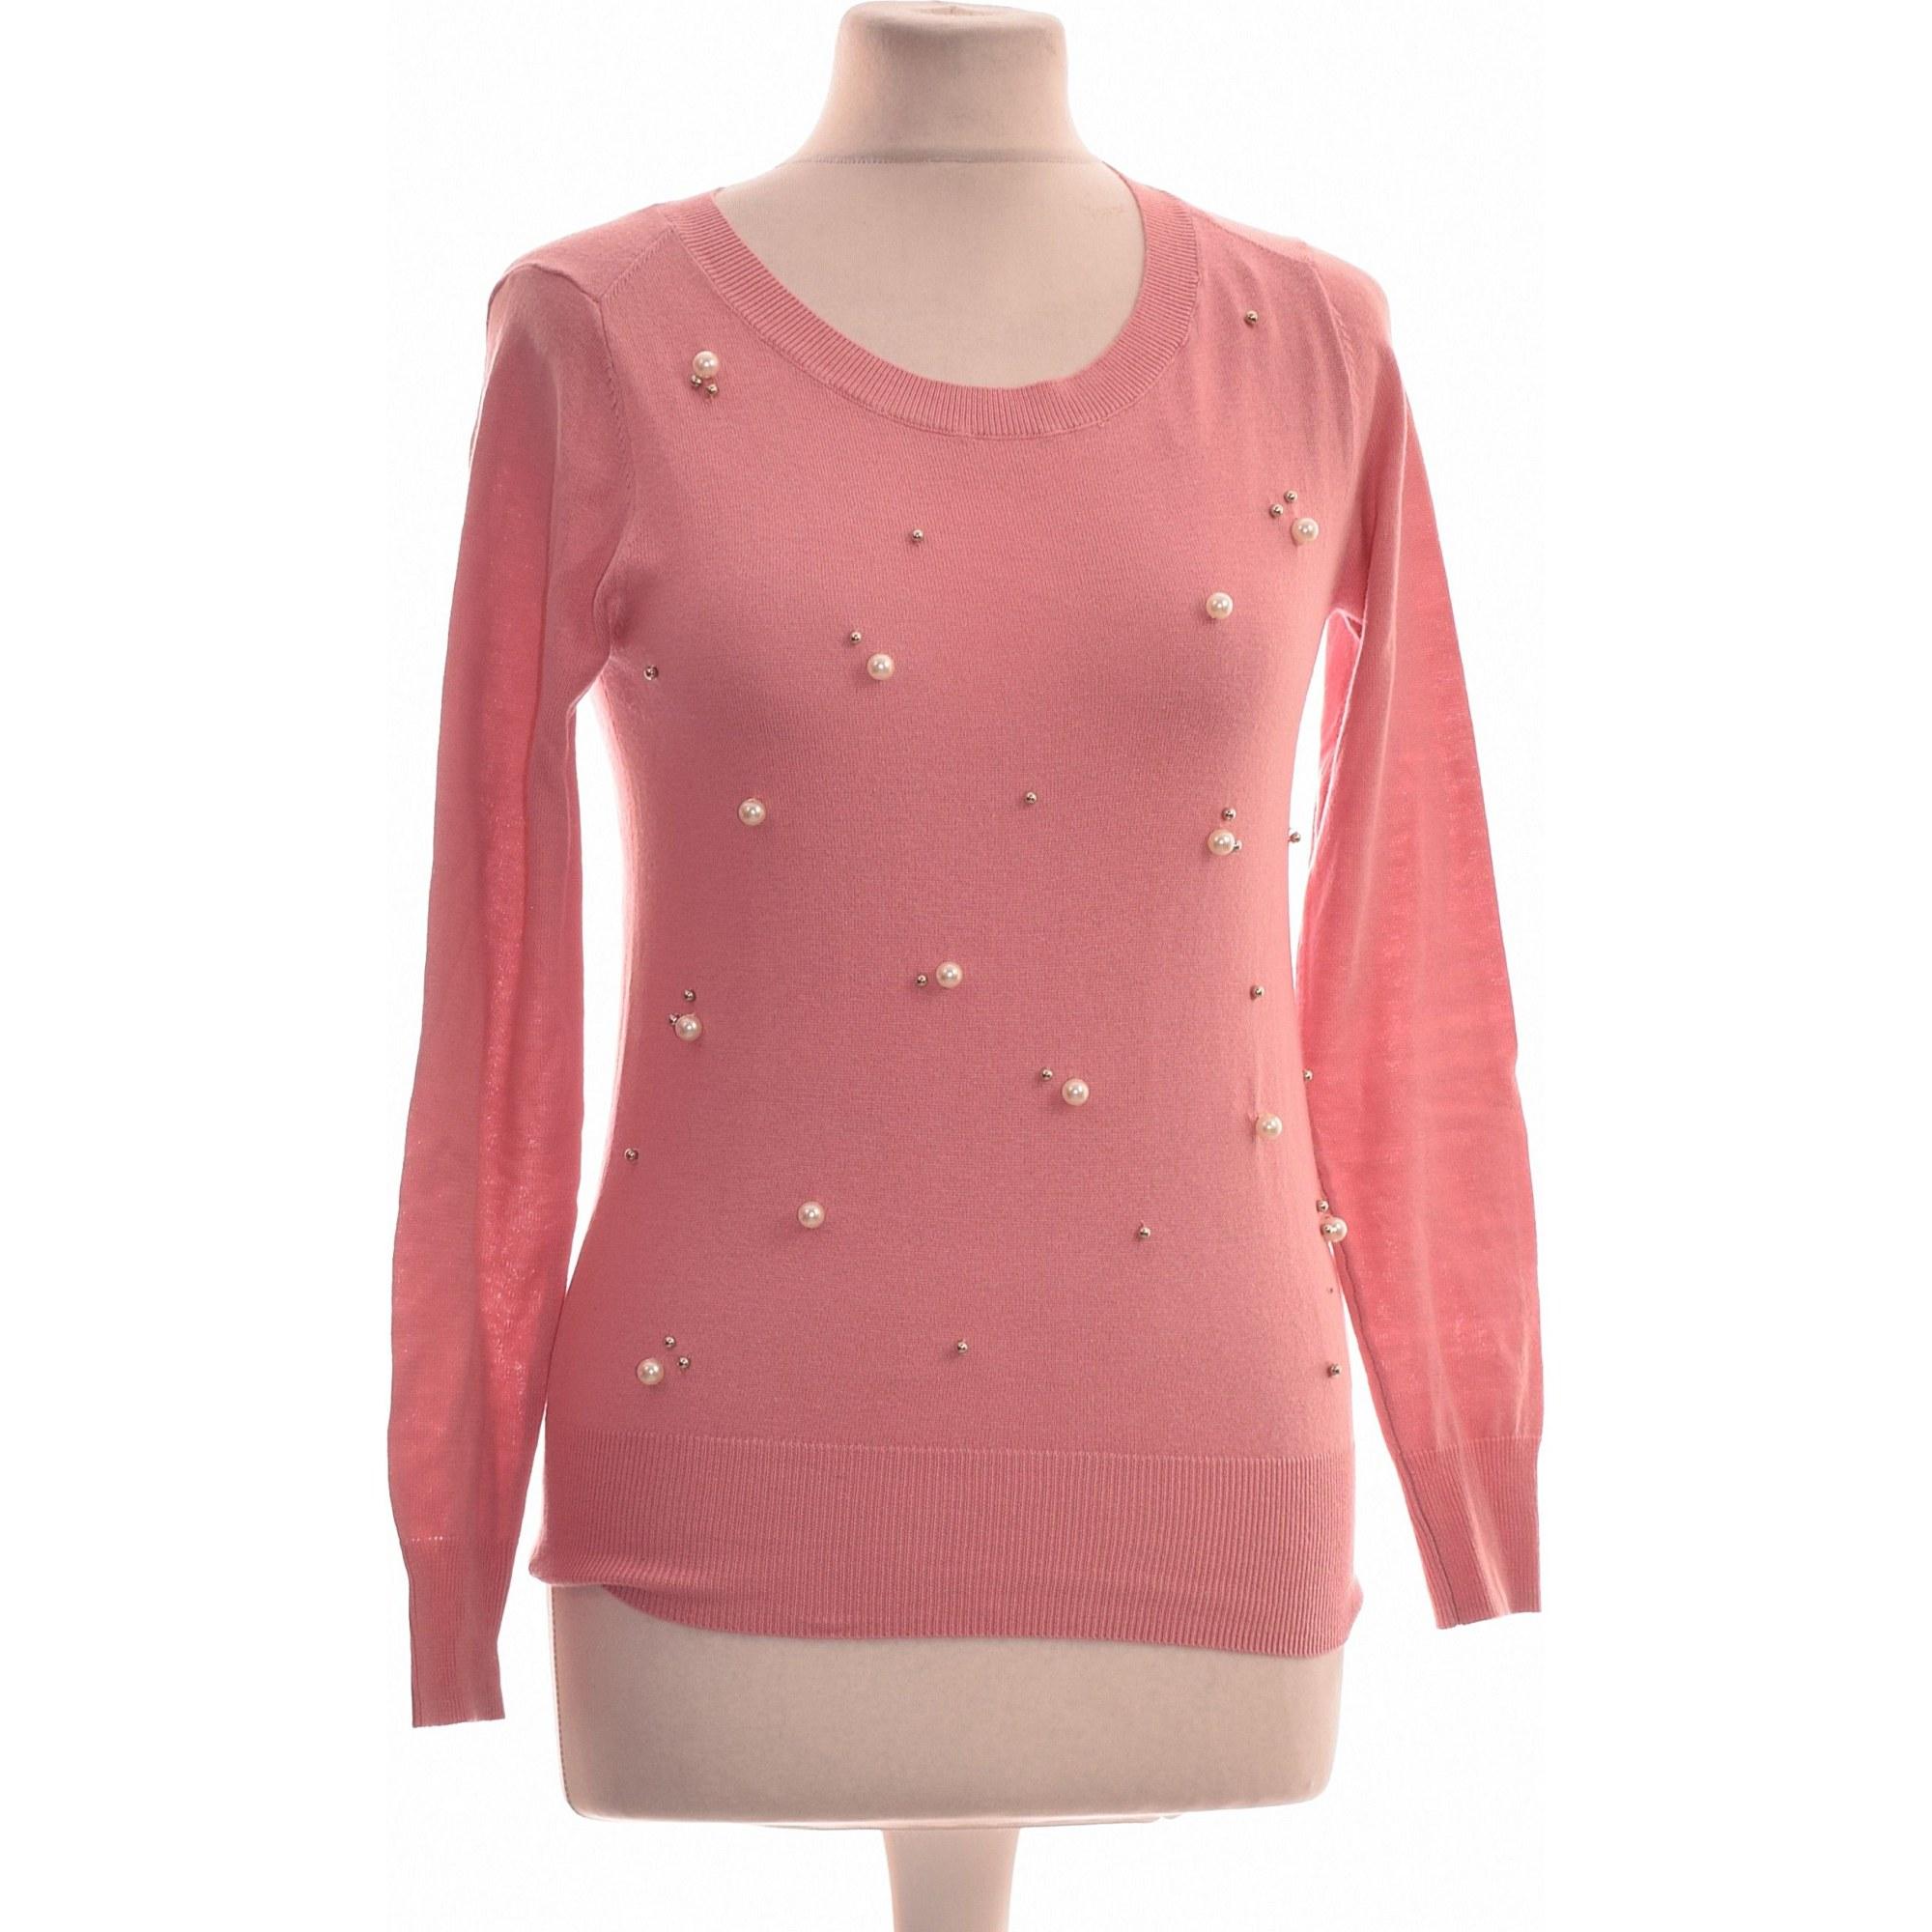 Top, tee-shirt SINÉQUANONE Rose, fuschia, vieux rose